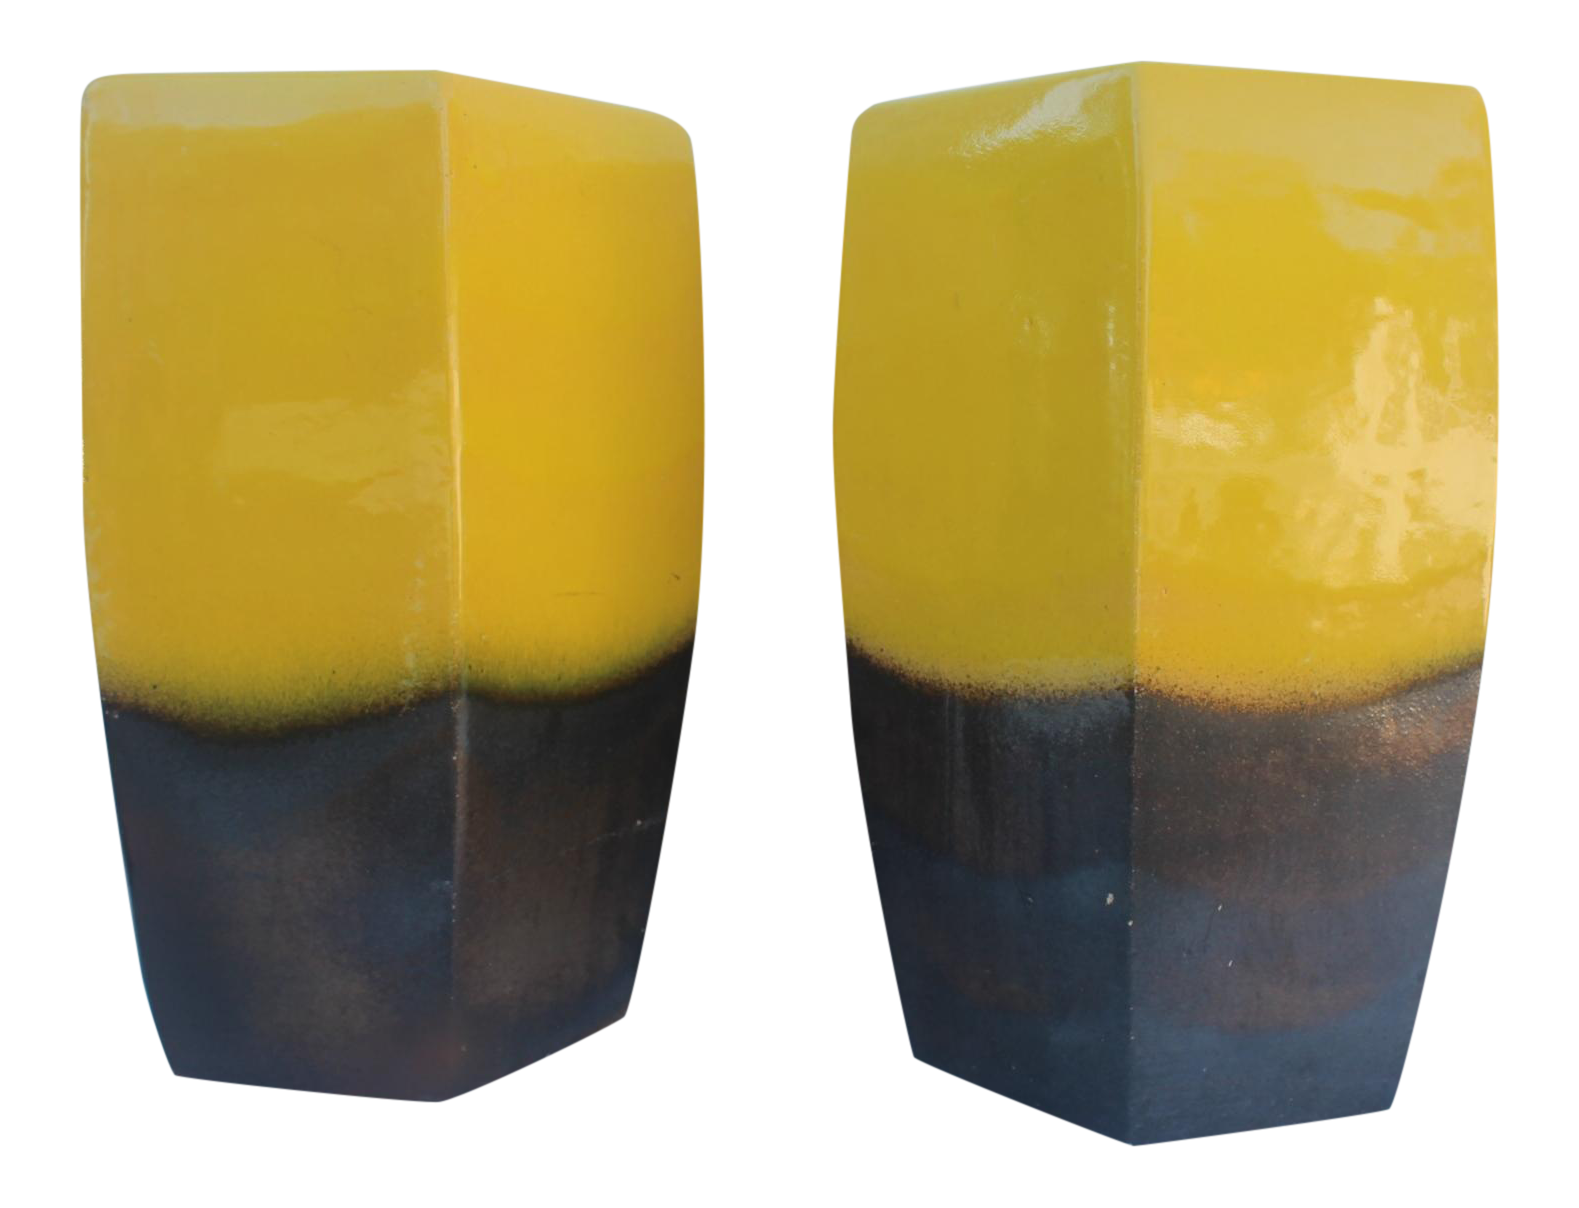 Vintage Yellow Ceramic Garden Stools A Pair Chairish